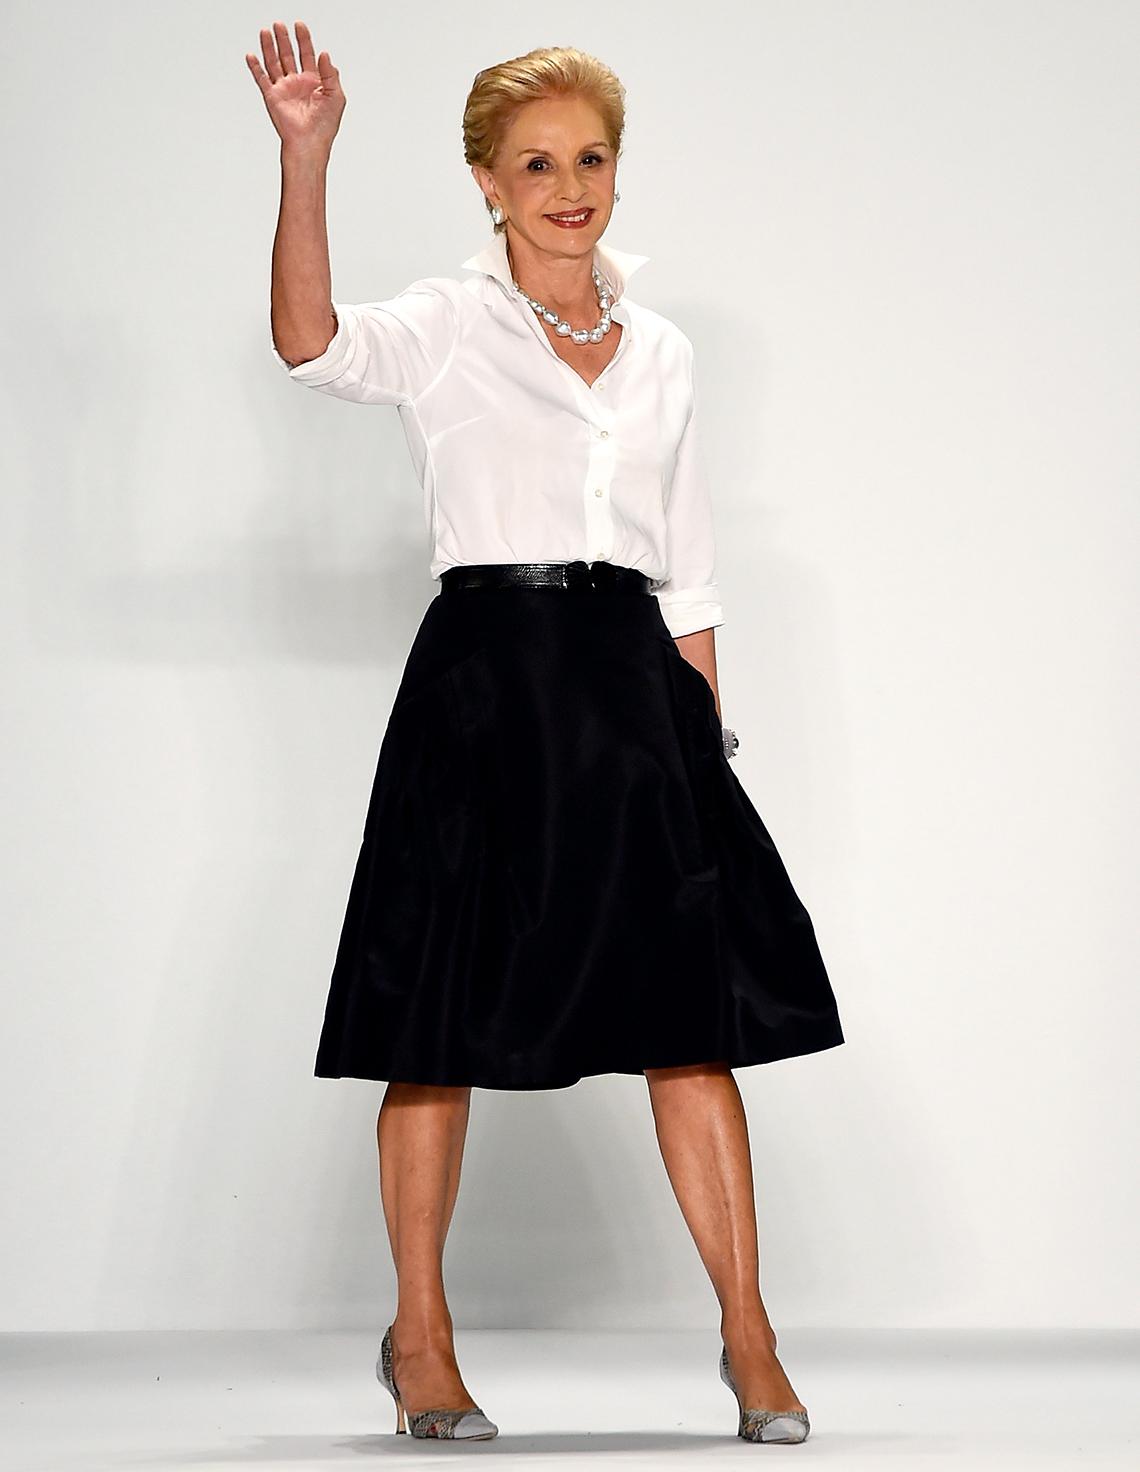 carolina herrera walks runway while waving at audience